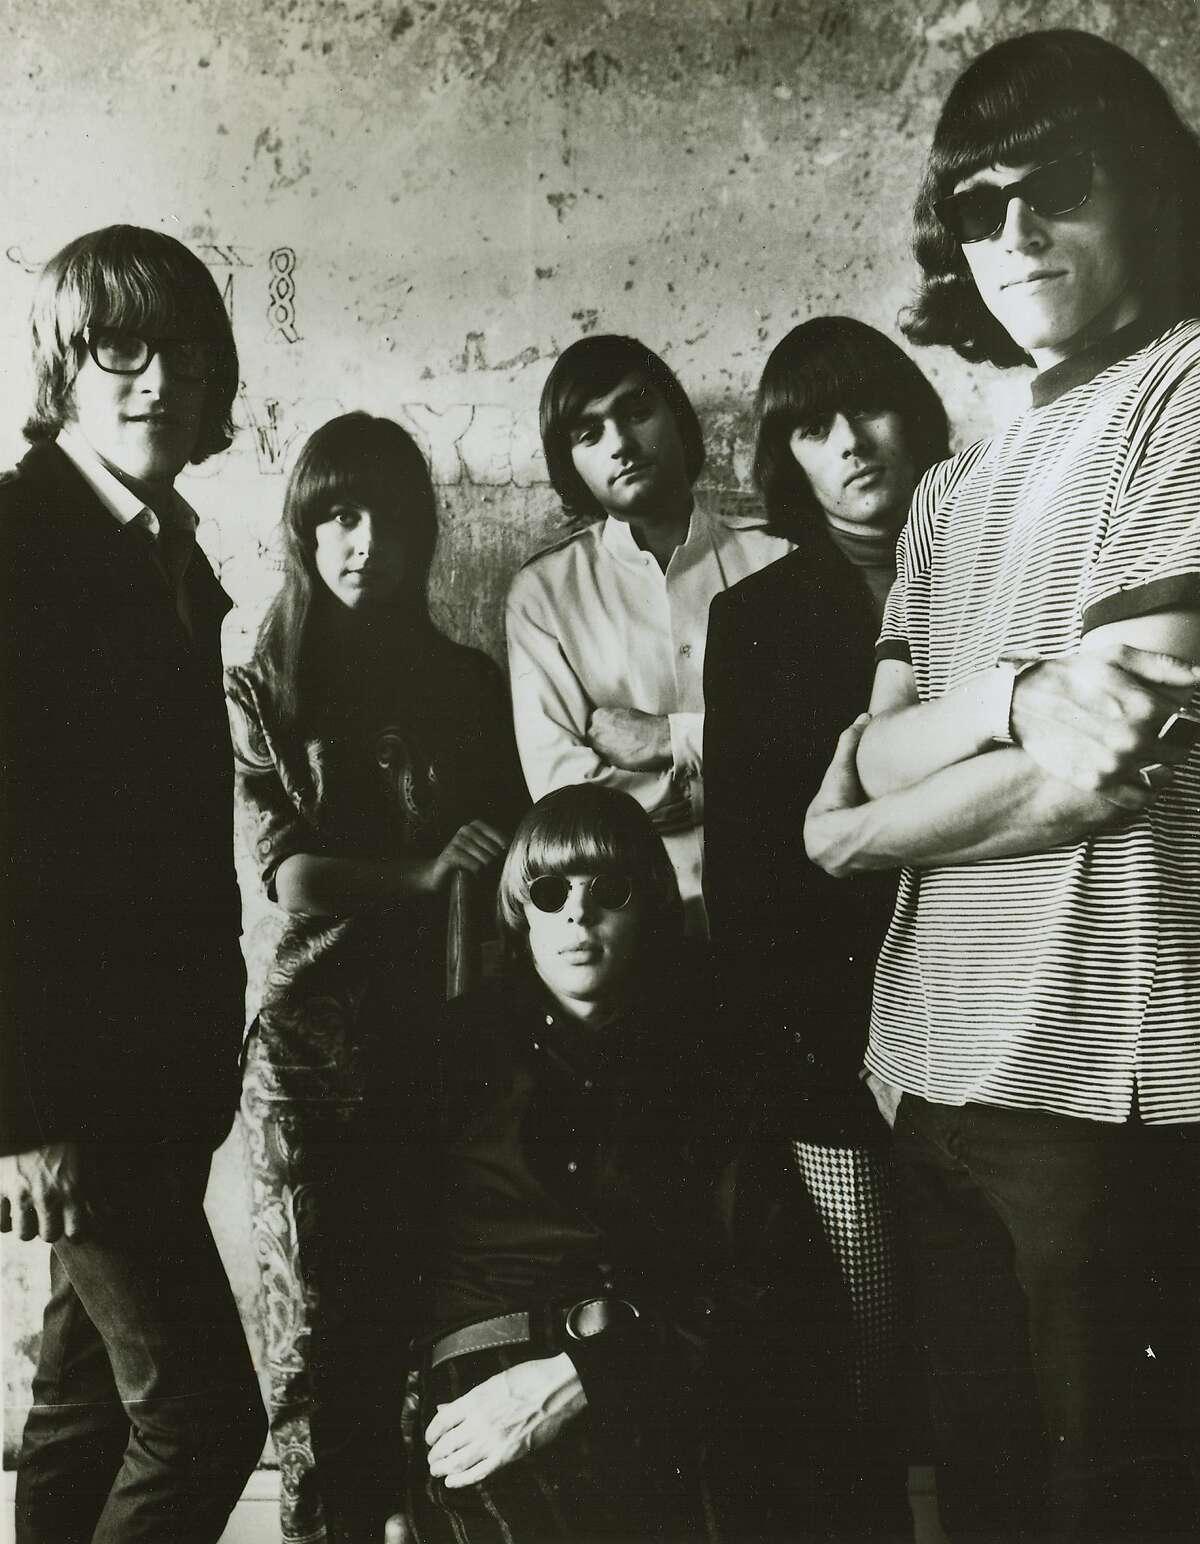 rockroll_144_6.jpg 1968- Jefferson Airplane. Standing left to right: Paul Kantner, Grace Slick, Marty Balin, Spencer Dryden, Jorma Kaukonen. Seated: Jack Casady /